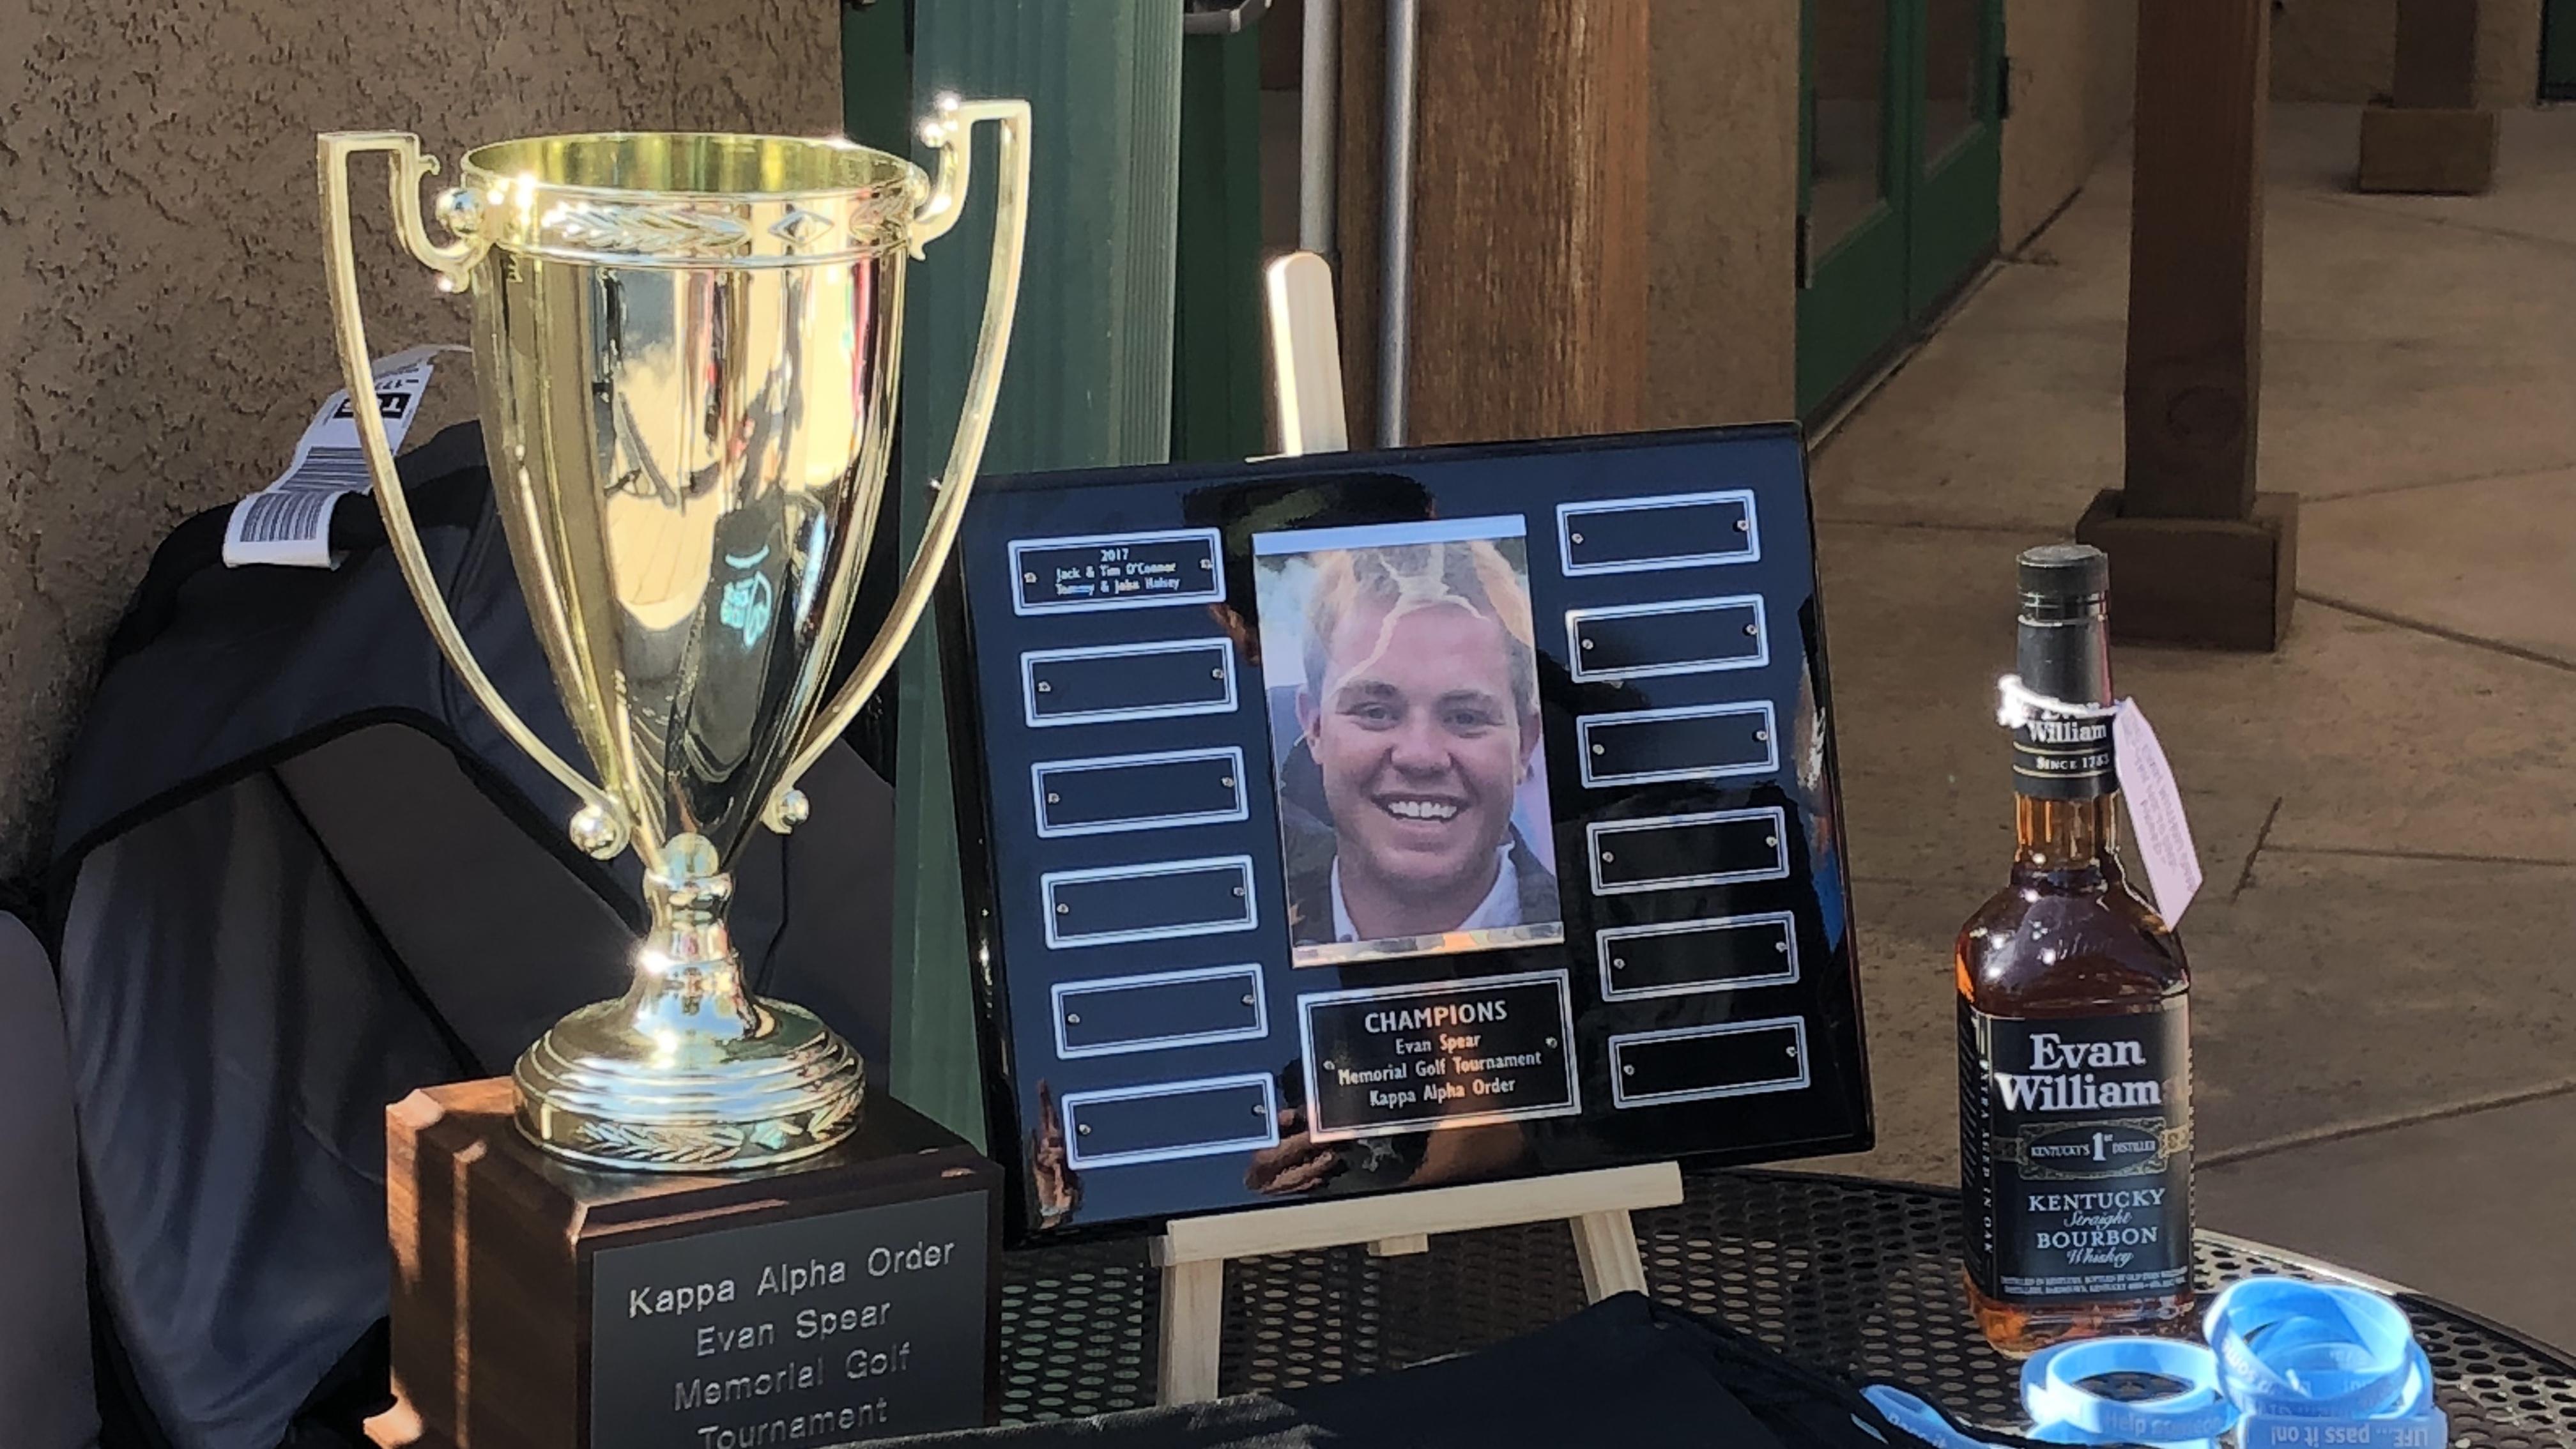 KA - Evan Spear Memorial Golf Tournament gallery image #10